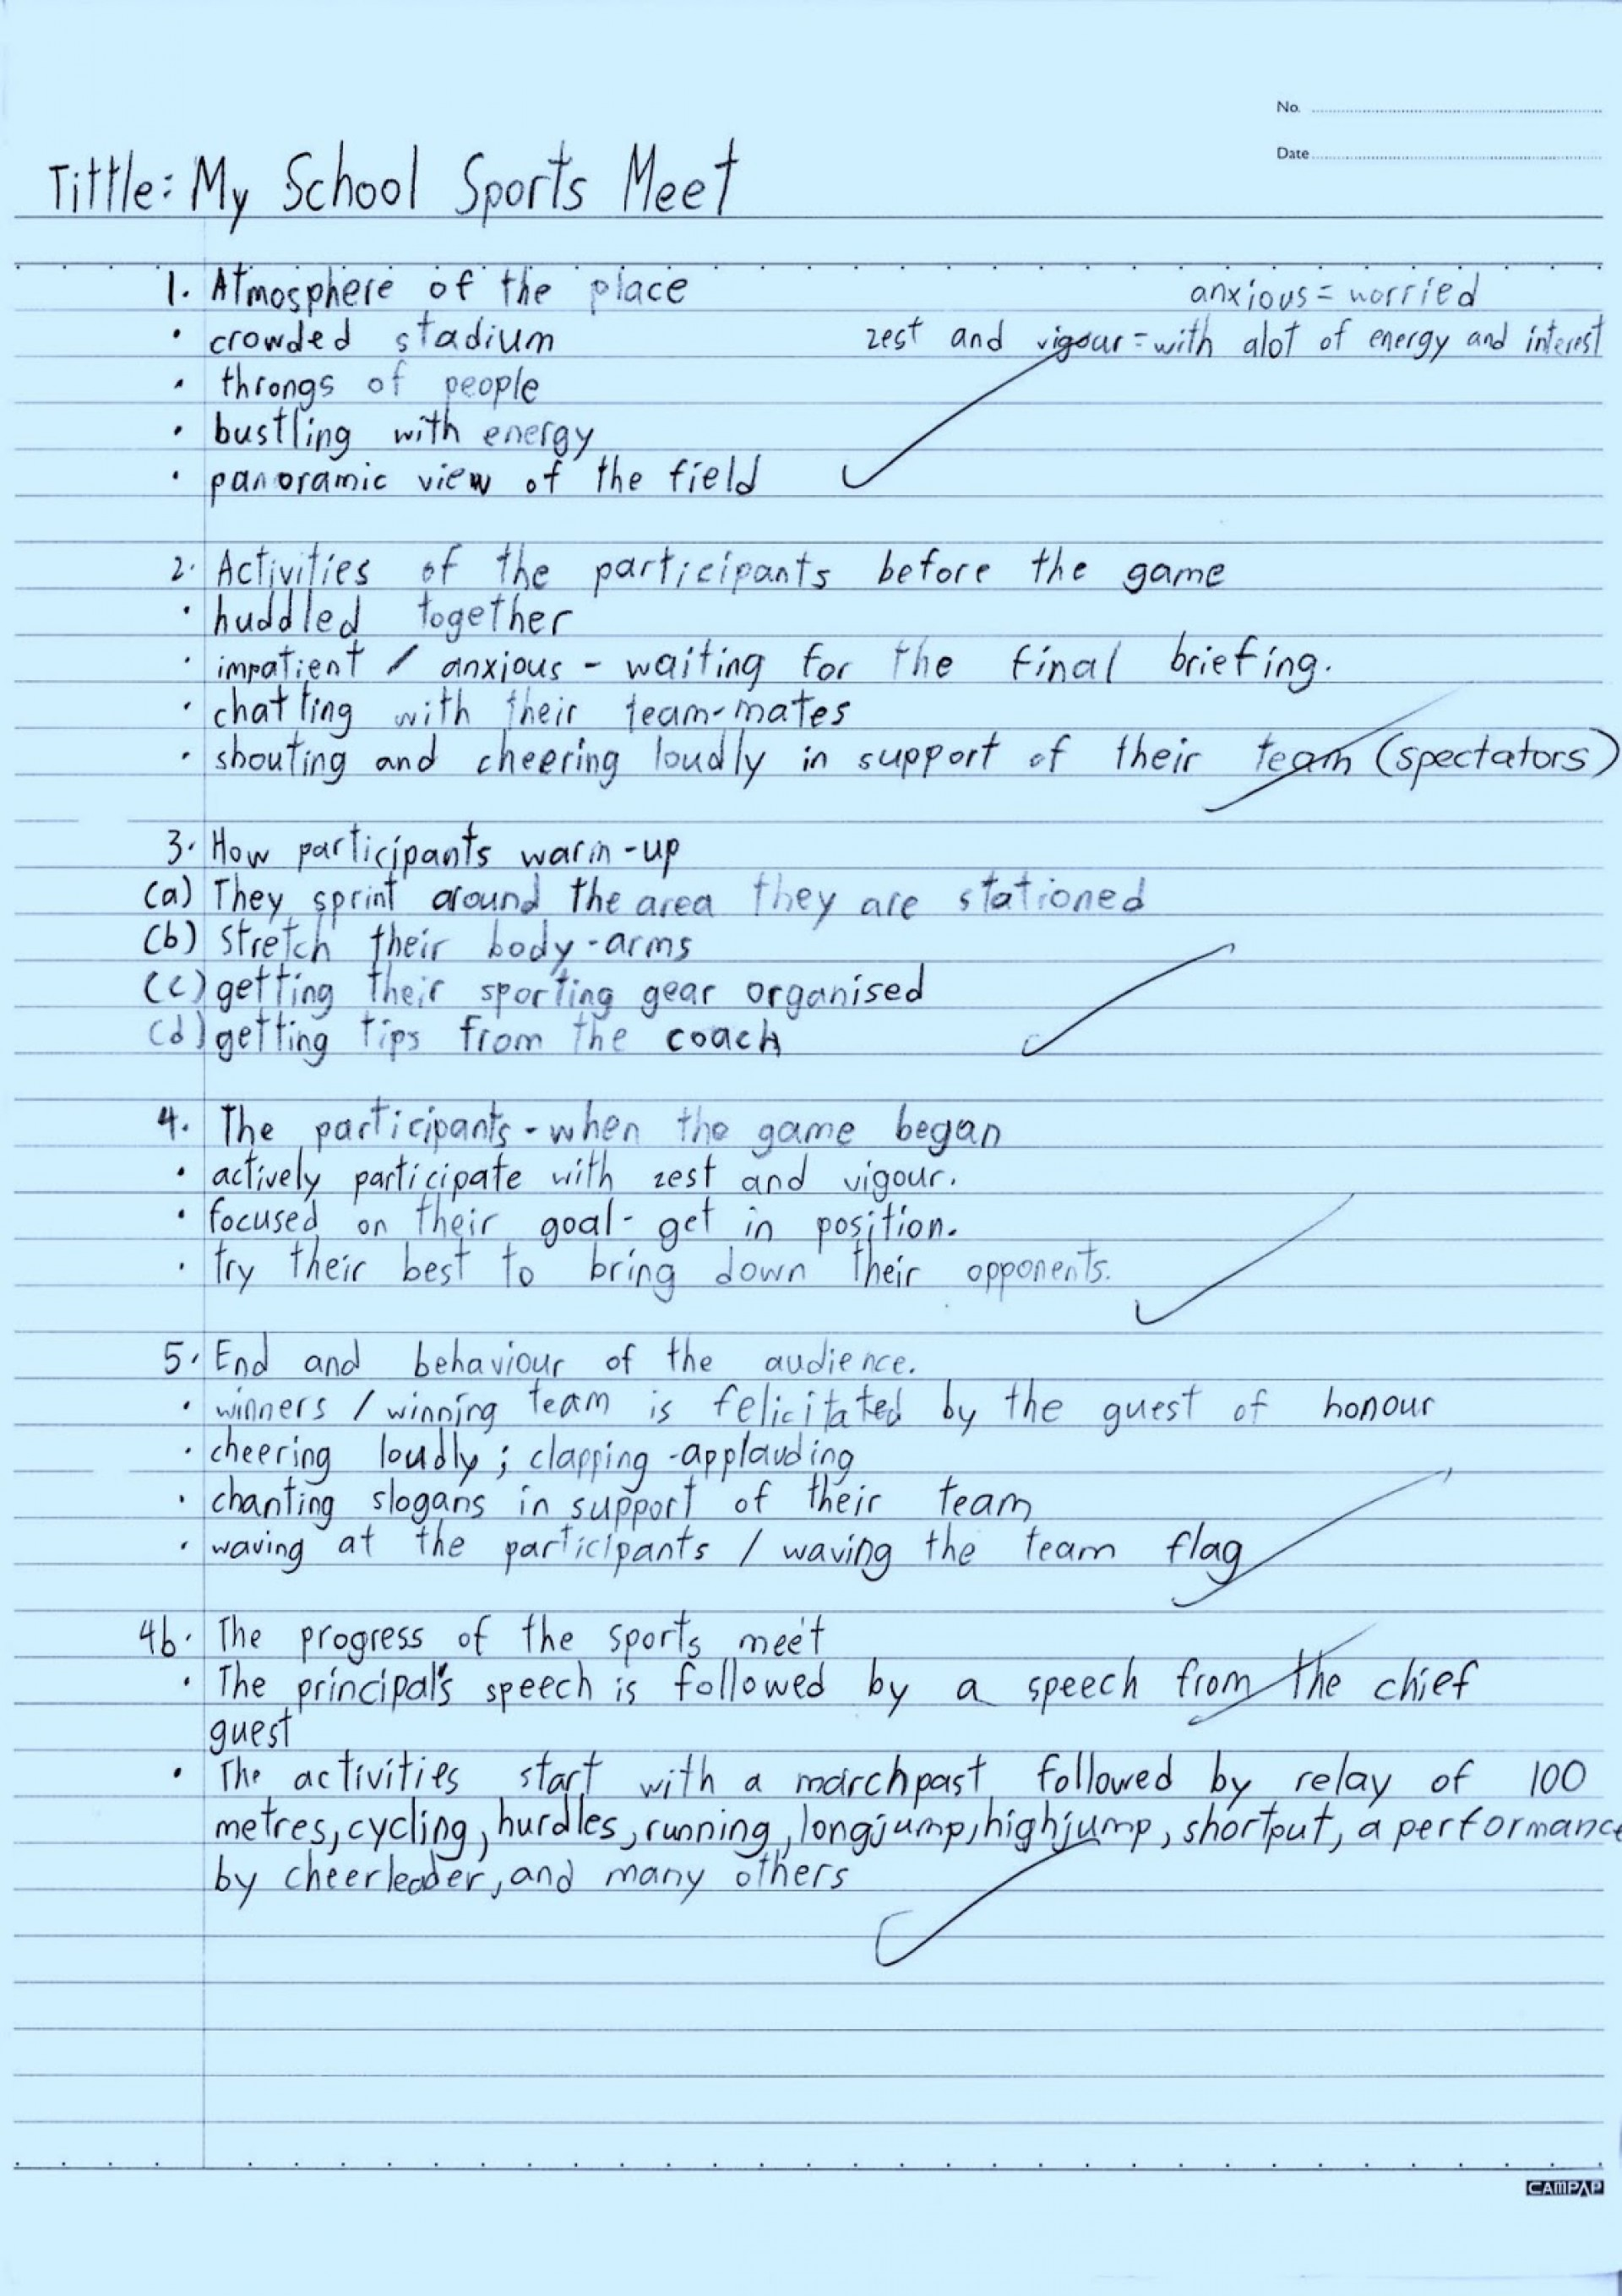 015 My School Essay 20130304171511 00002 Amazing Dream For Class 10 In Urdu 1 3 Marathi 1920